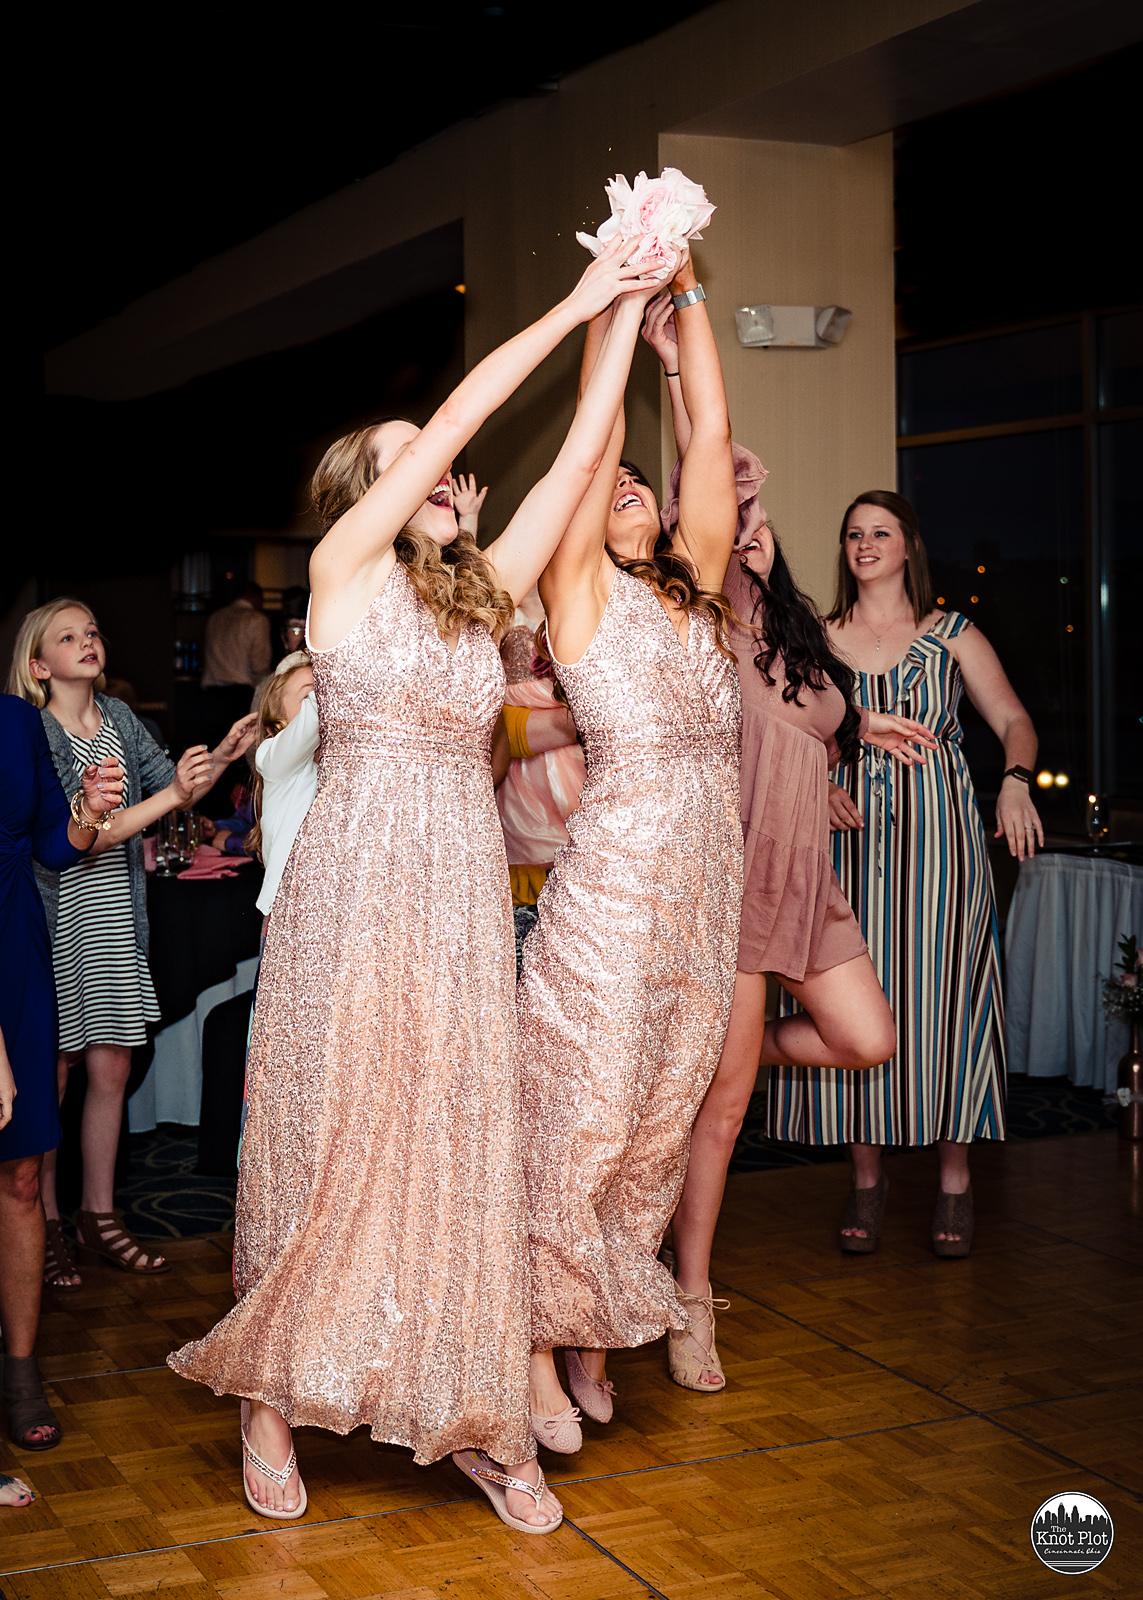 Embassy-Suites-Rivercenter-Cincinnati-Wedding-Photography-29.jpg